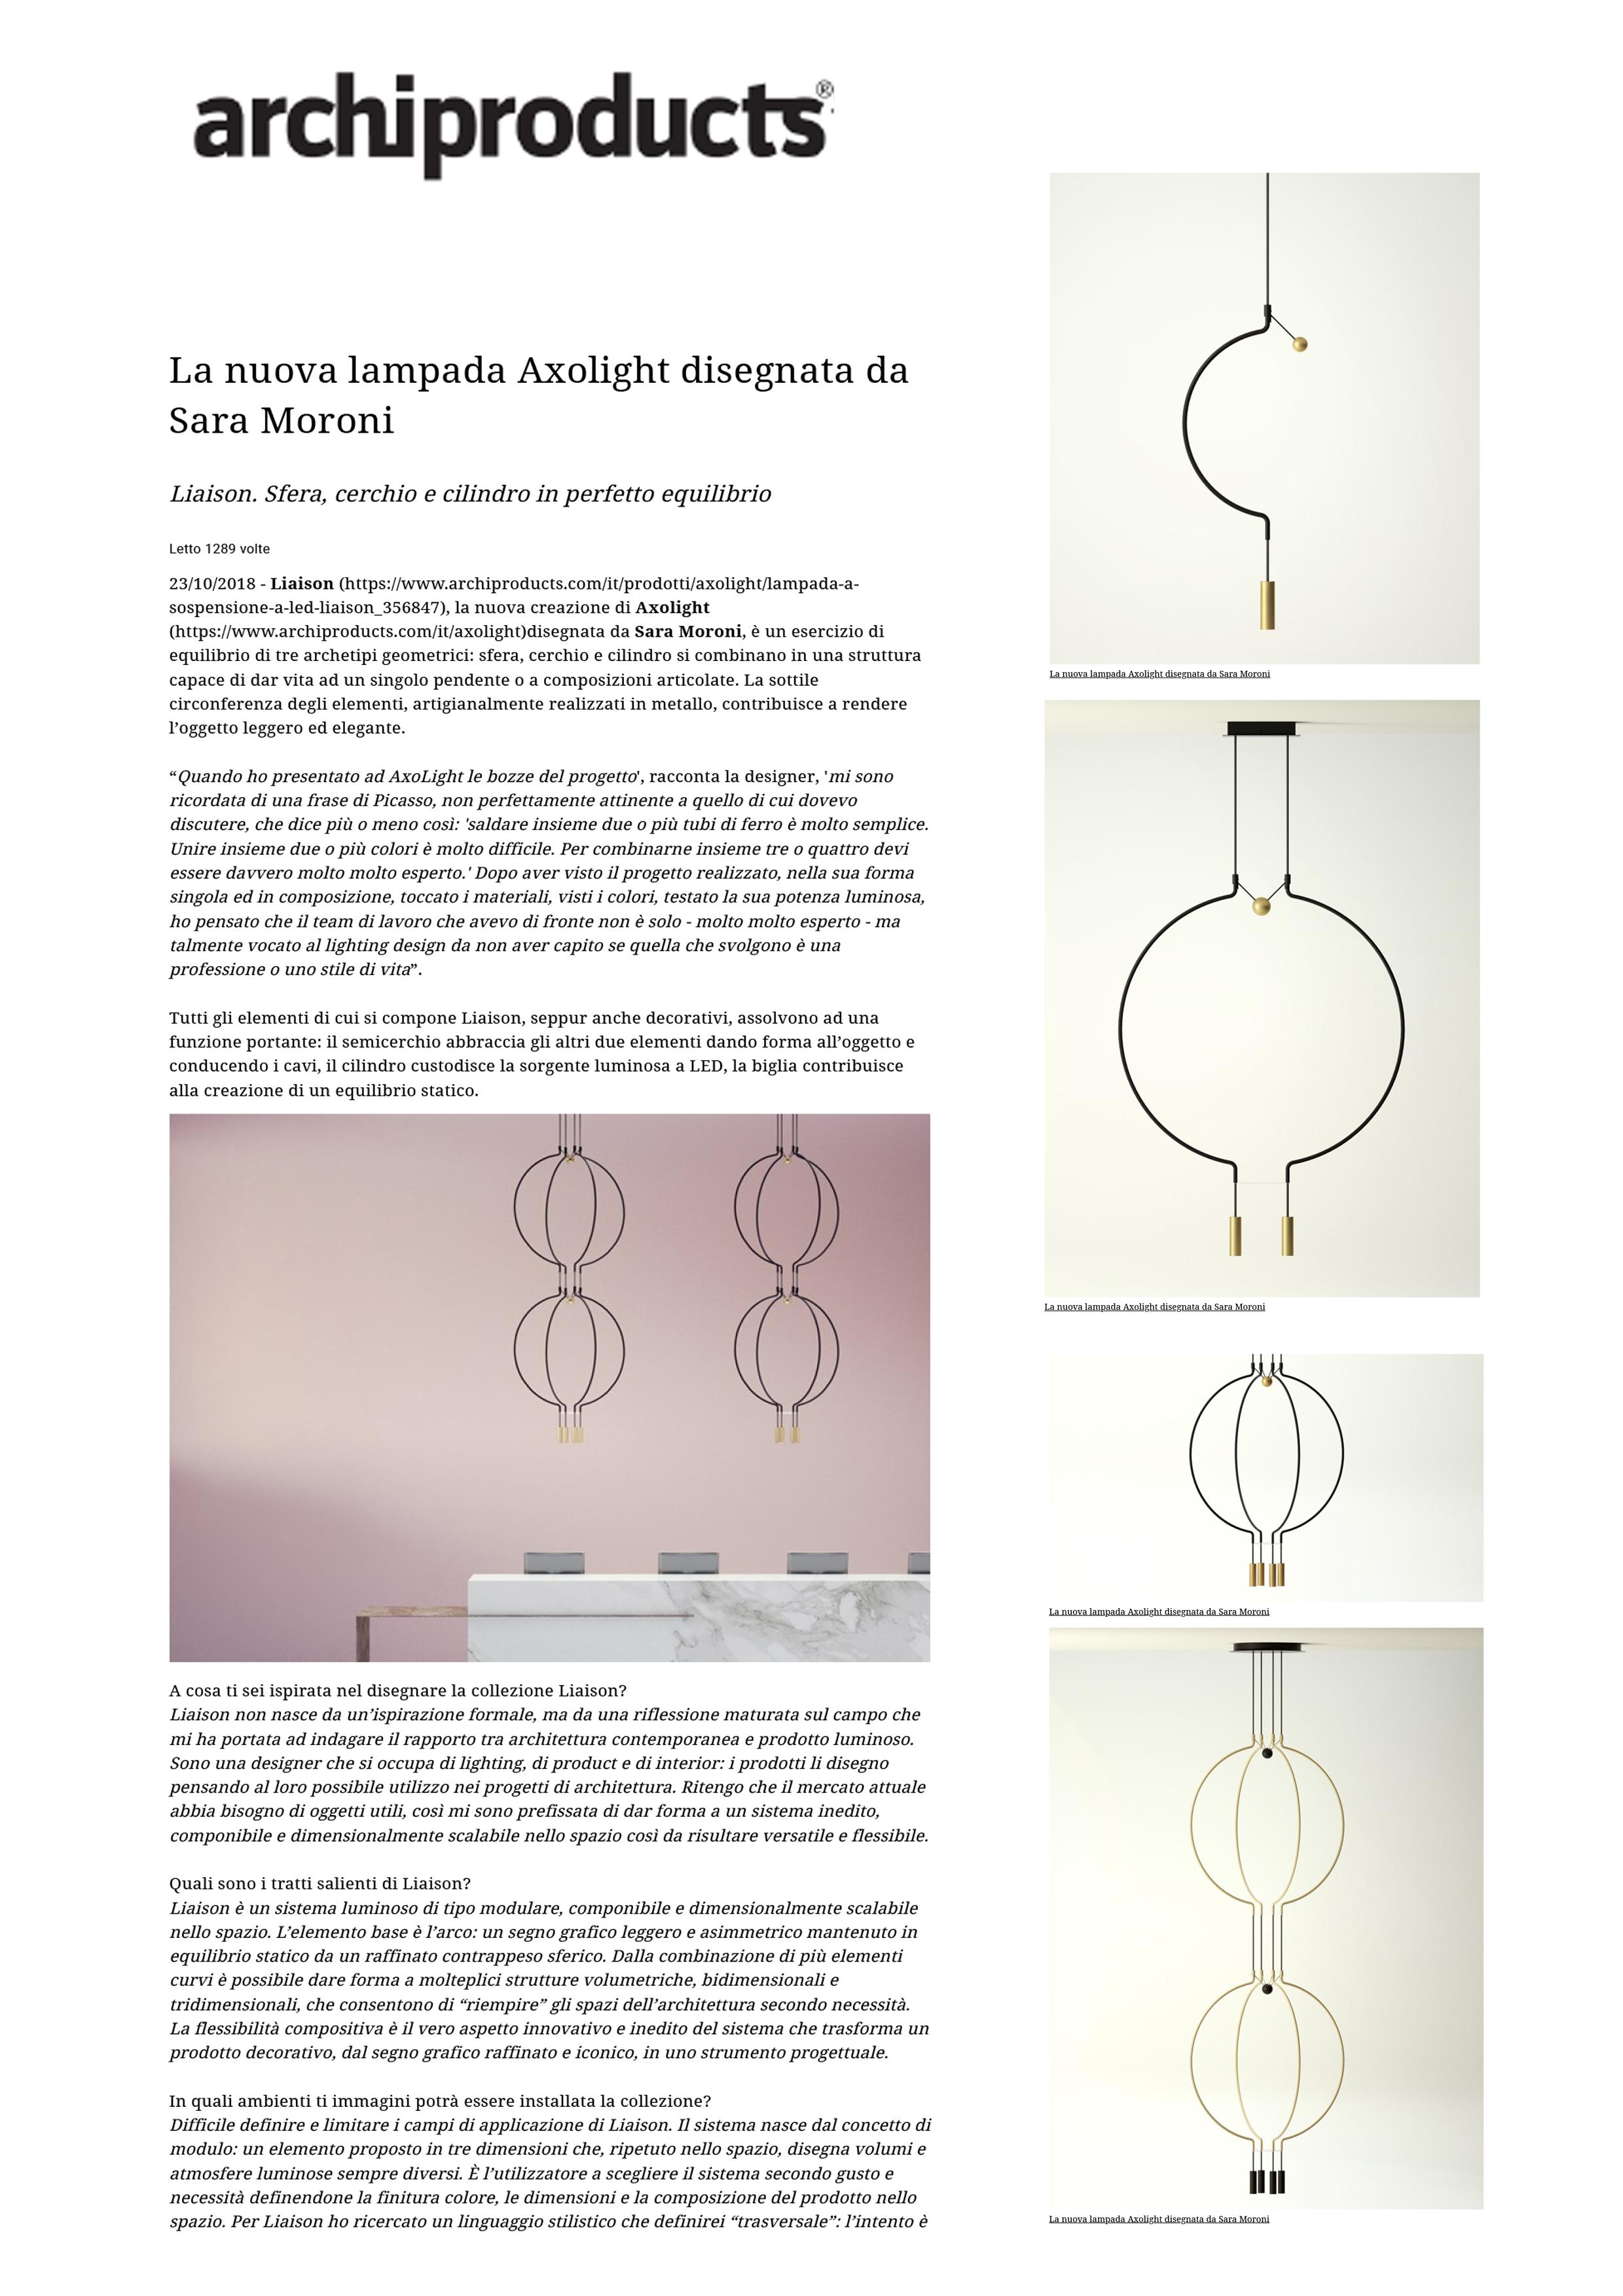 Archiproducts_La nuova lampada Axolight disegnata da Sara Moroni